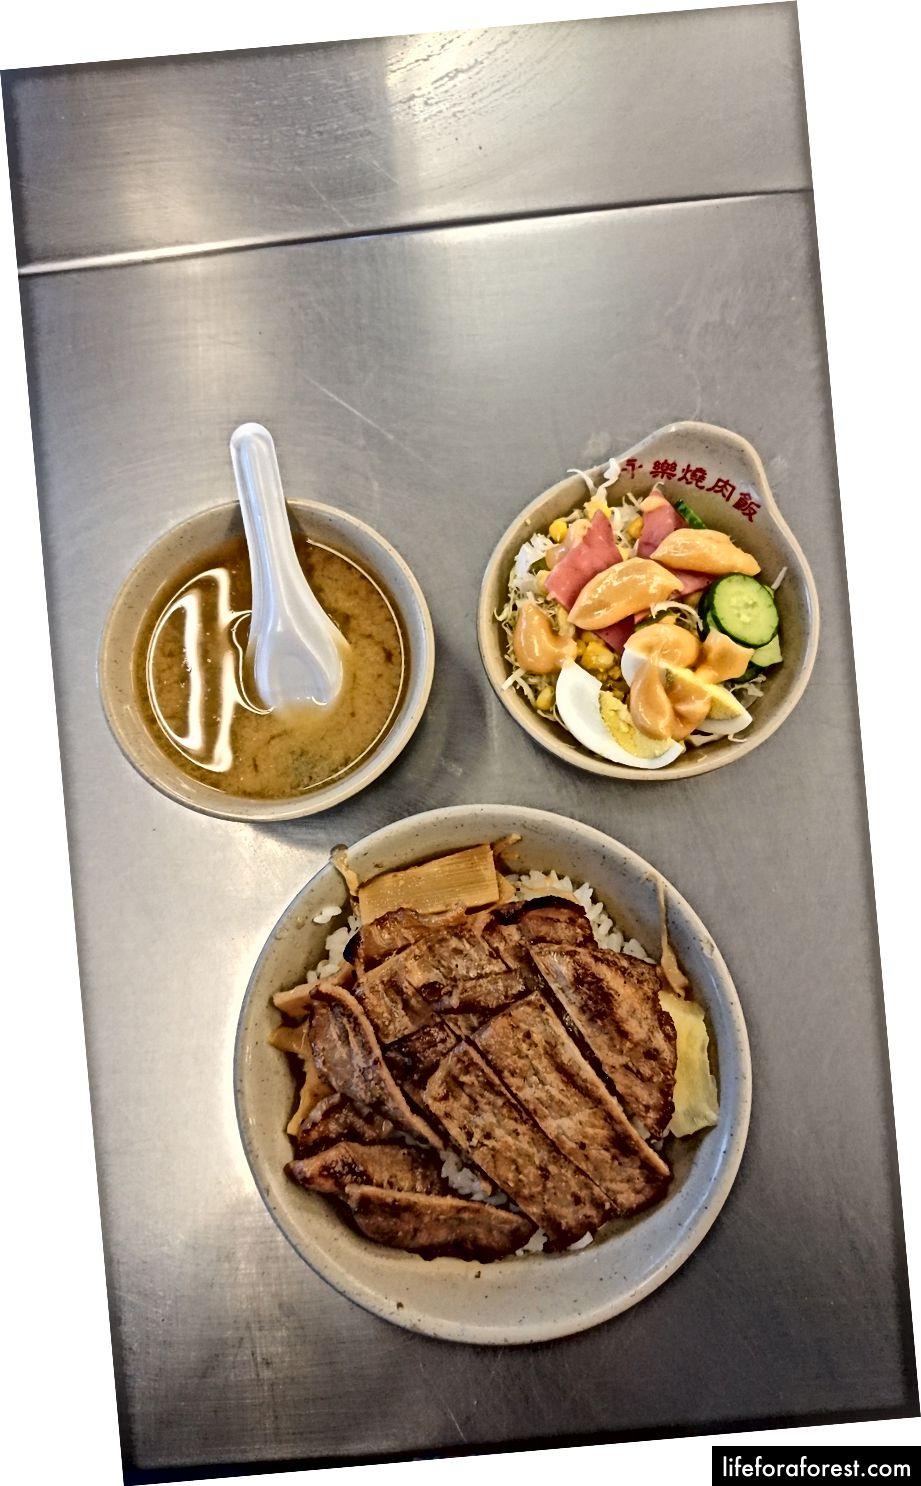 Yong-Le Roasted Pork Rice 永樂 燒肉 飯